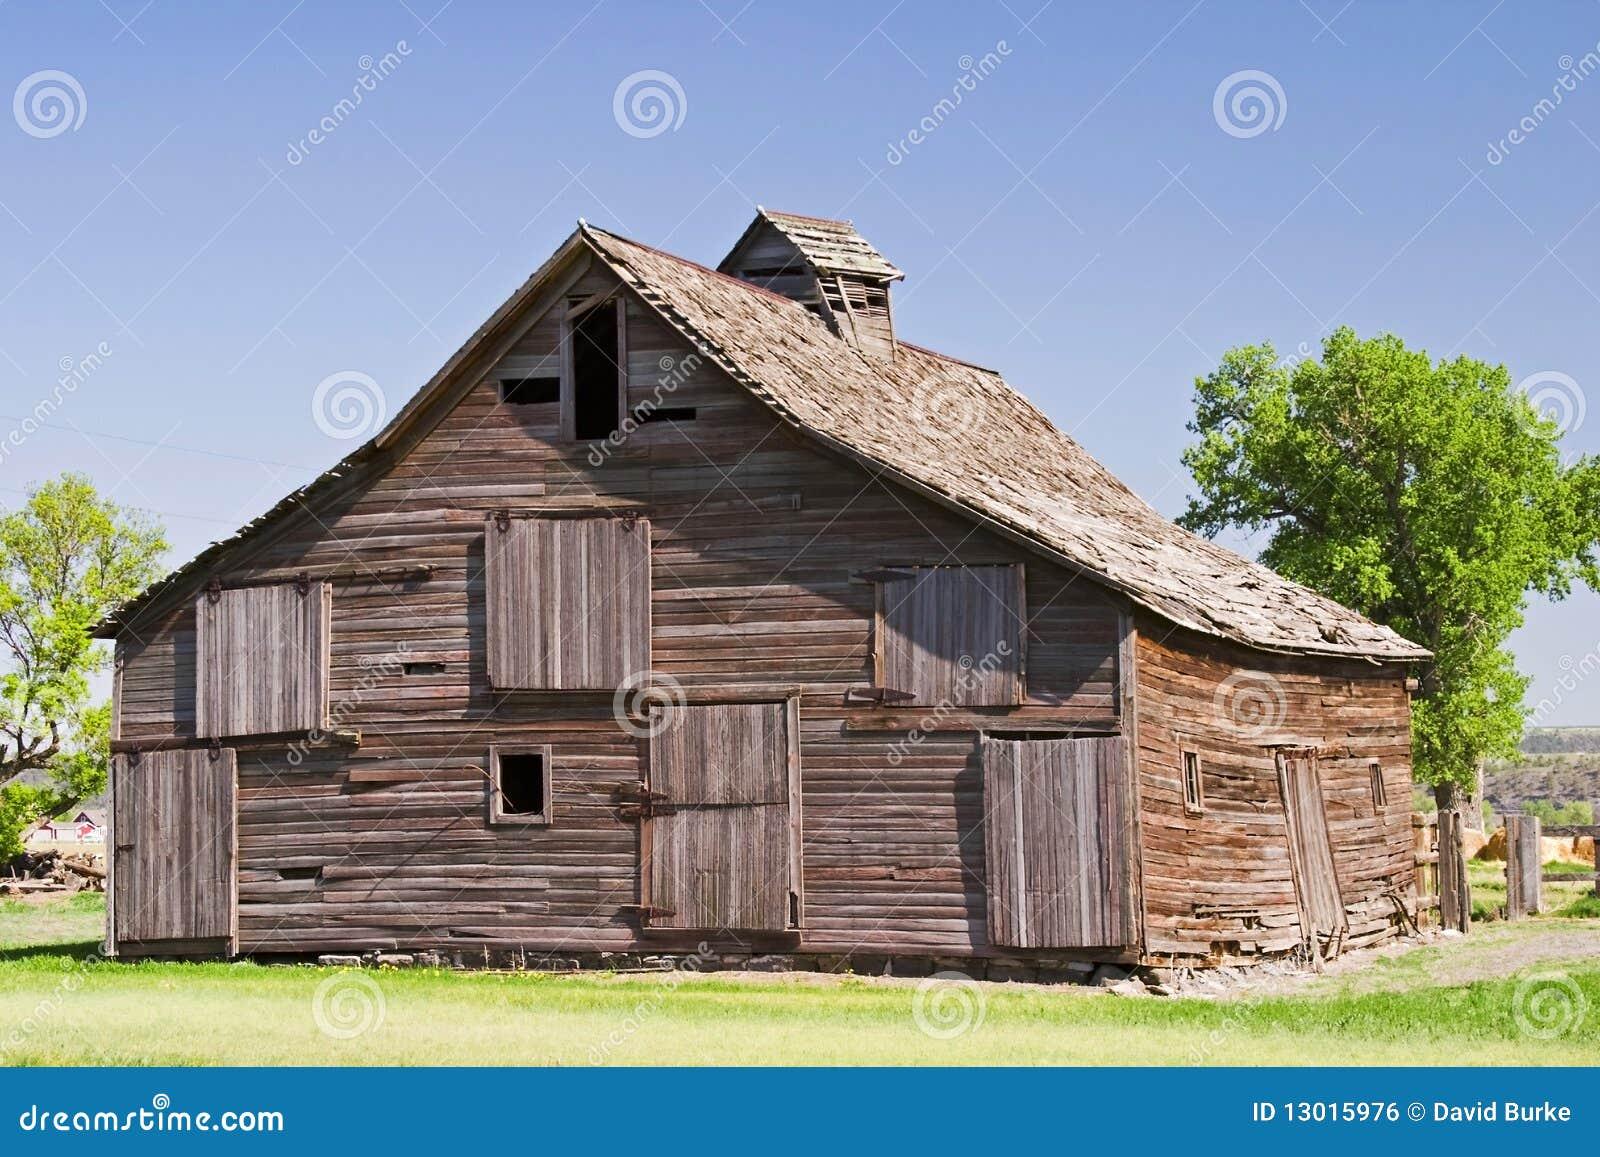 Old sagging barn